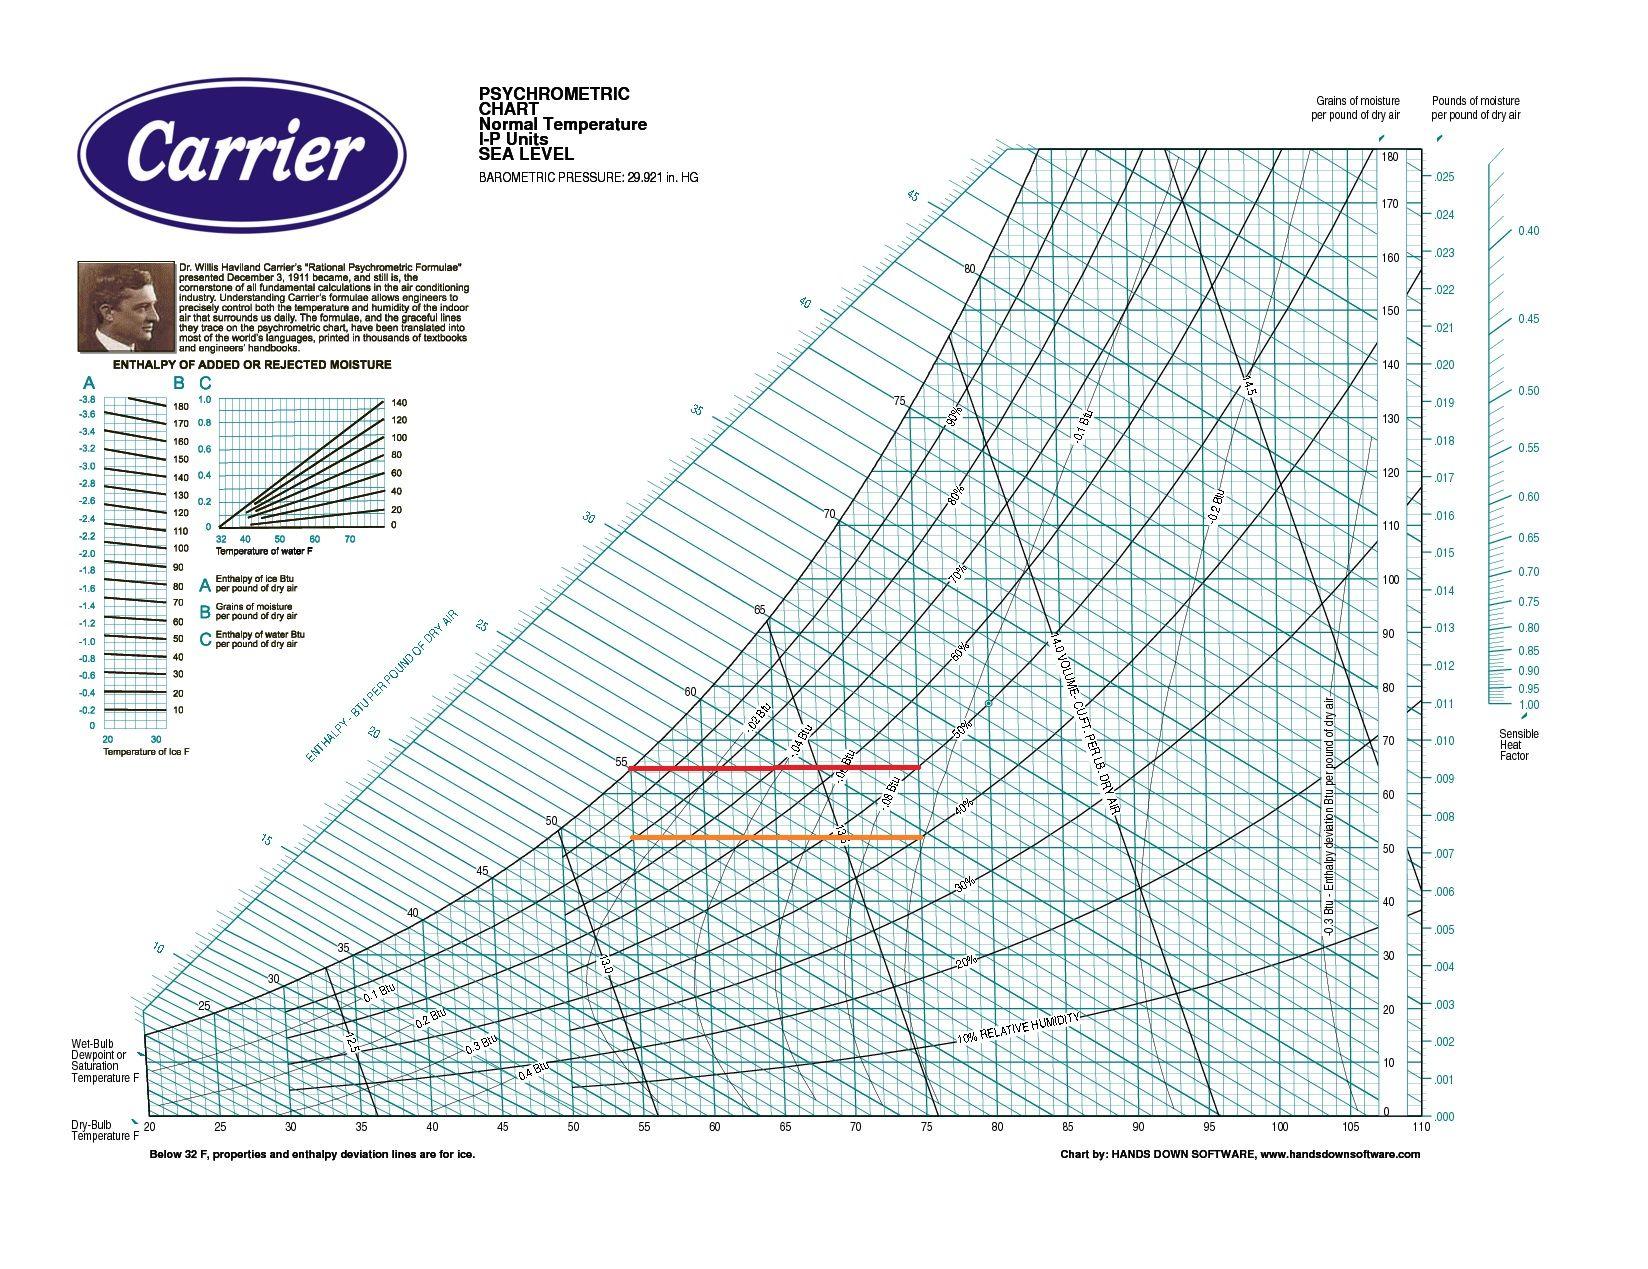 photo regarding Printable Psychrometric Chart identify The psychrometric chart exhibits few quanies: dry